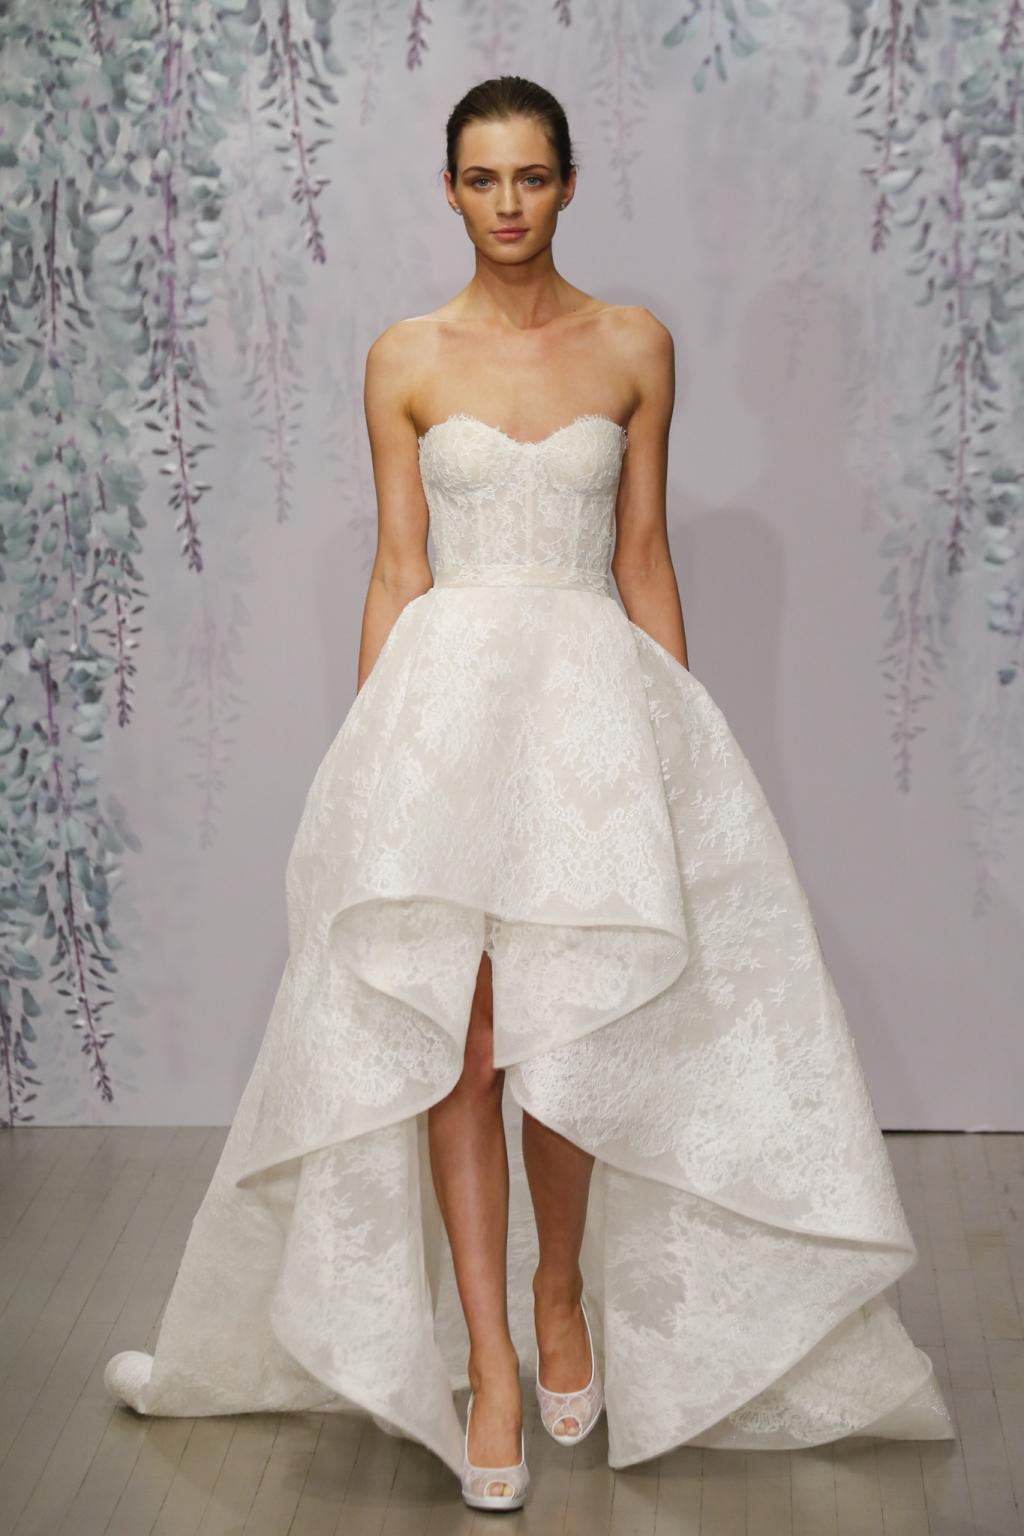 Monique Lhuillier Fall 2016 Wedding Dress Collection ...